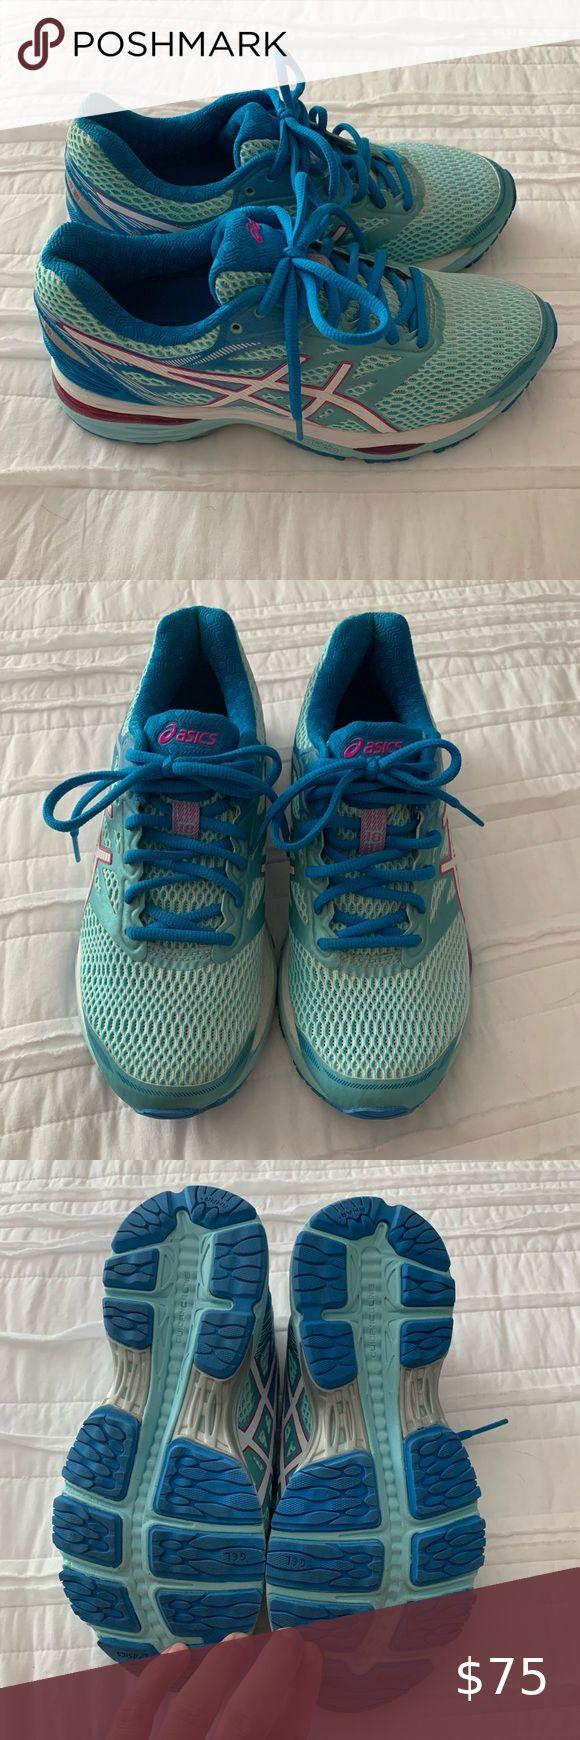 Asics Gel Cumulus 18 Running Shoes Asics Running Shoes Womens Running Shoes Asics Running Shoes